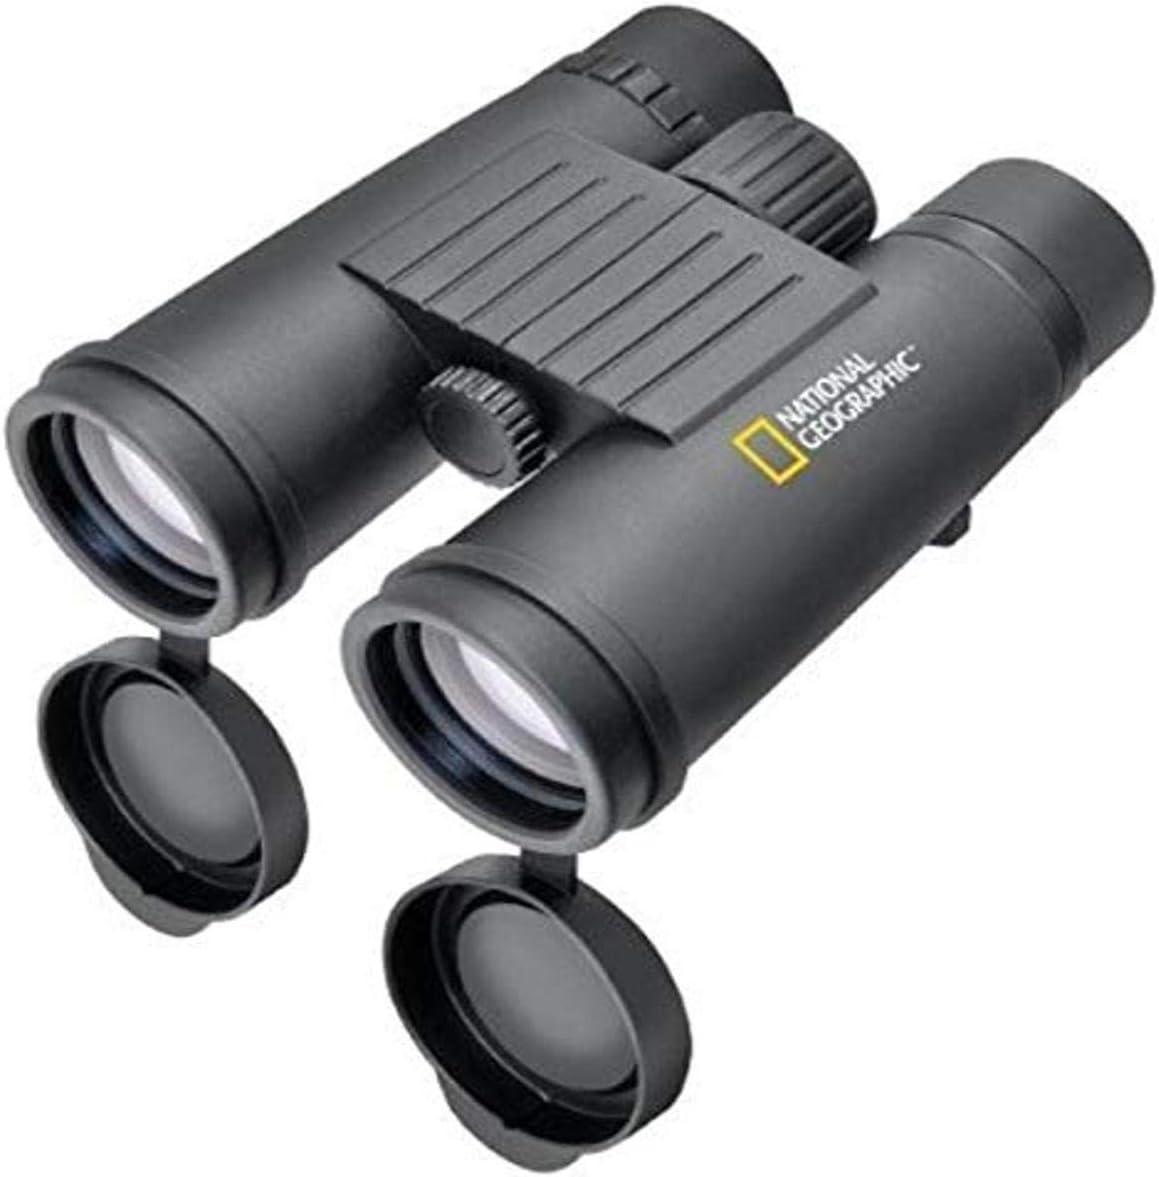 National Geographic It is very popular Rapid rise 8x 42mm Binoculars